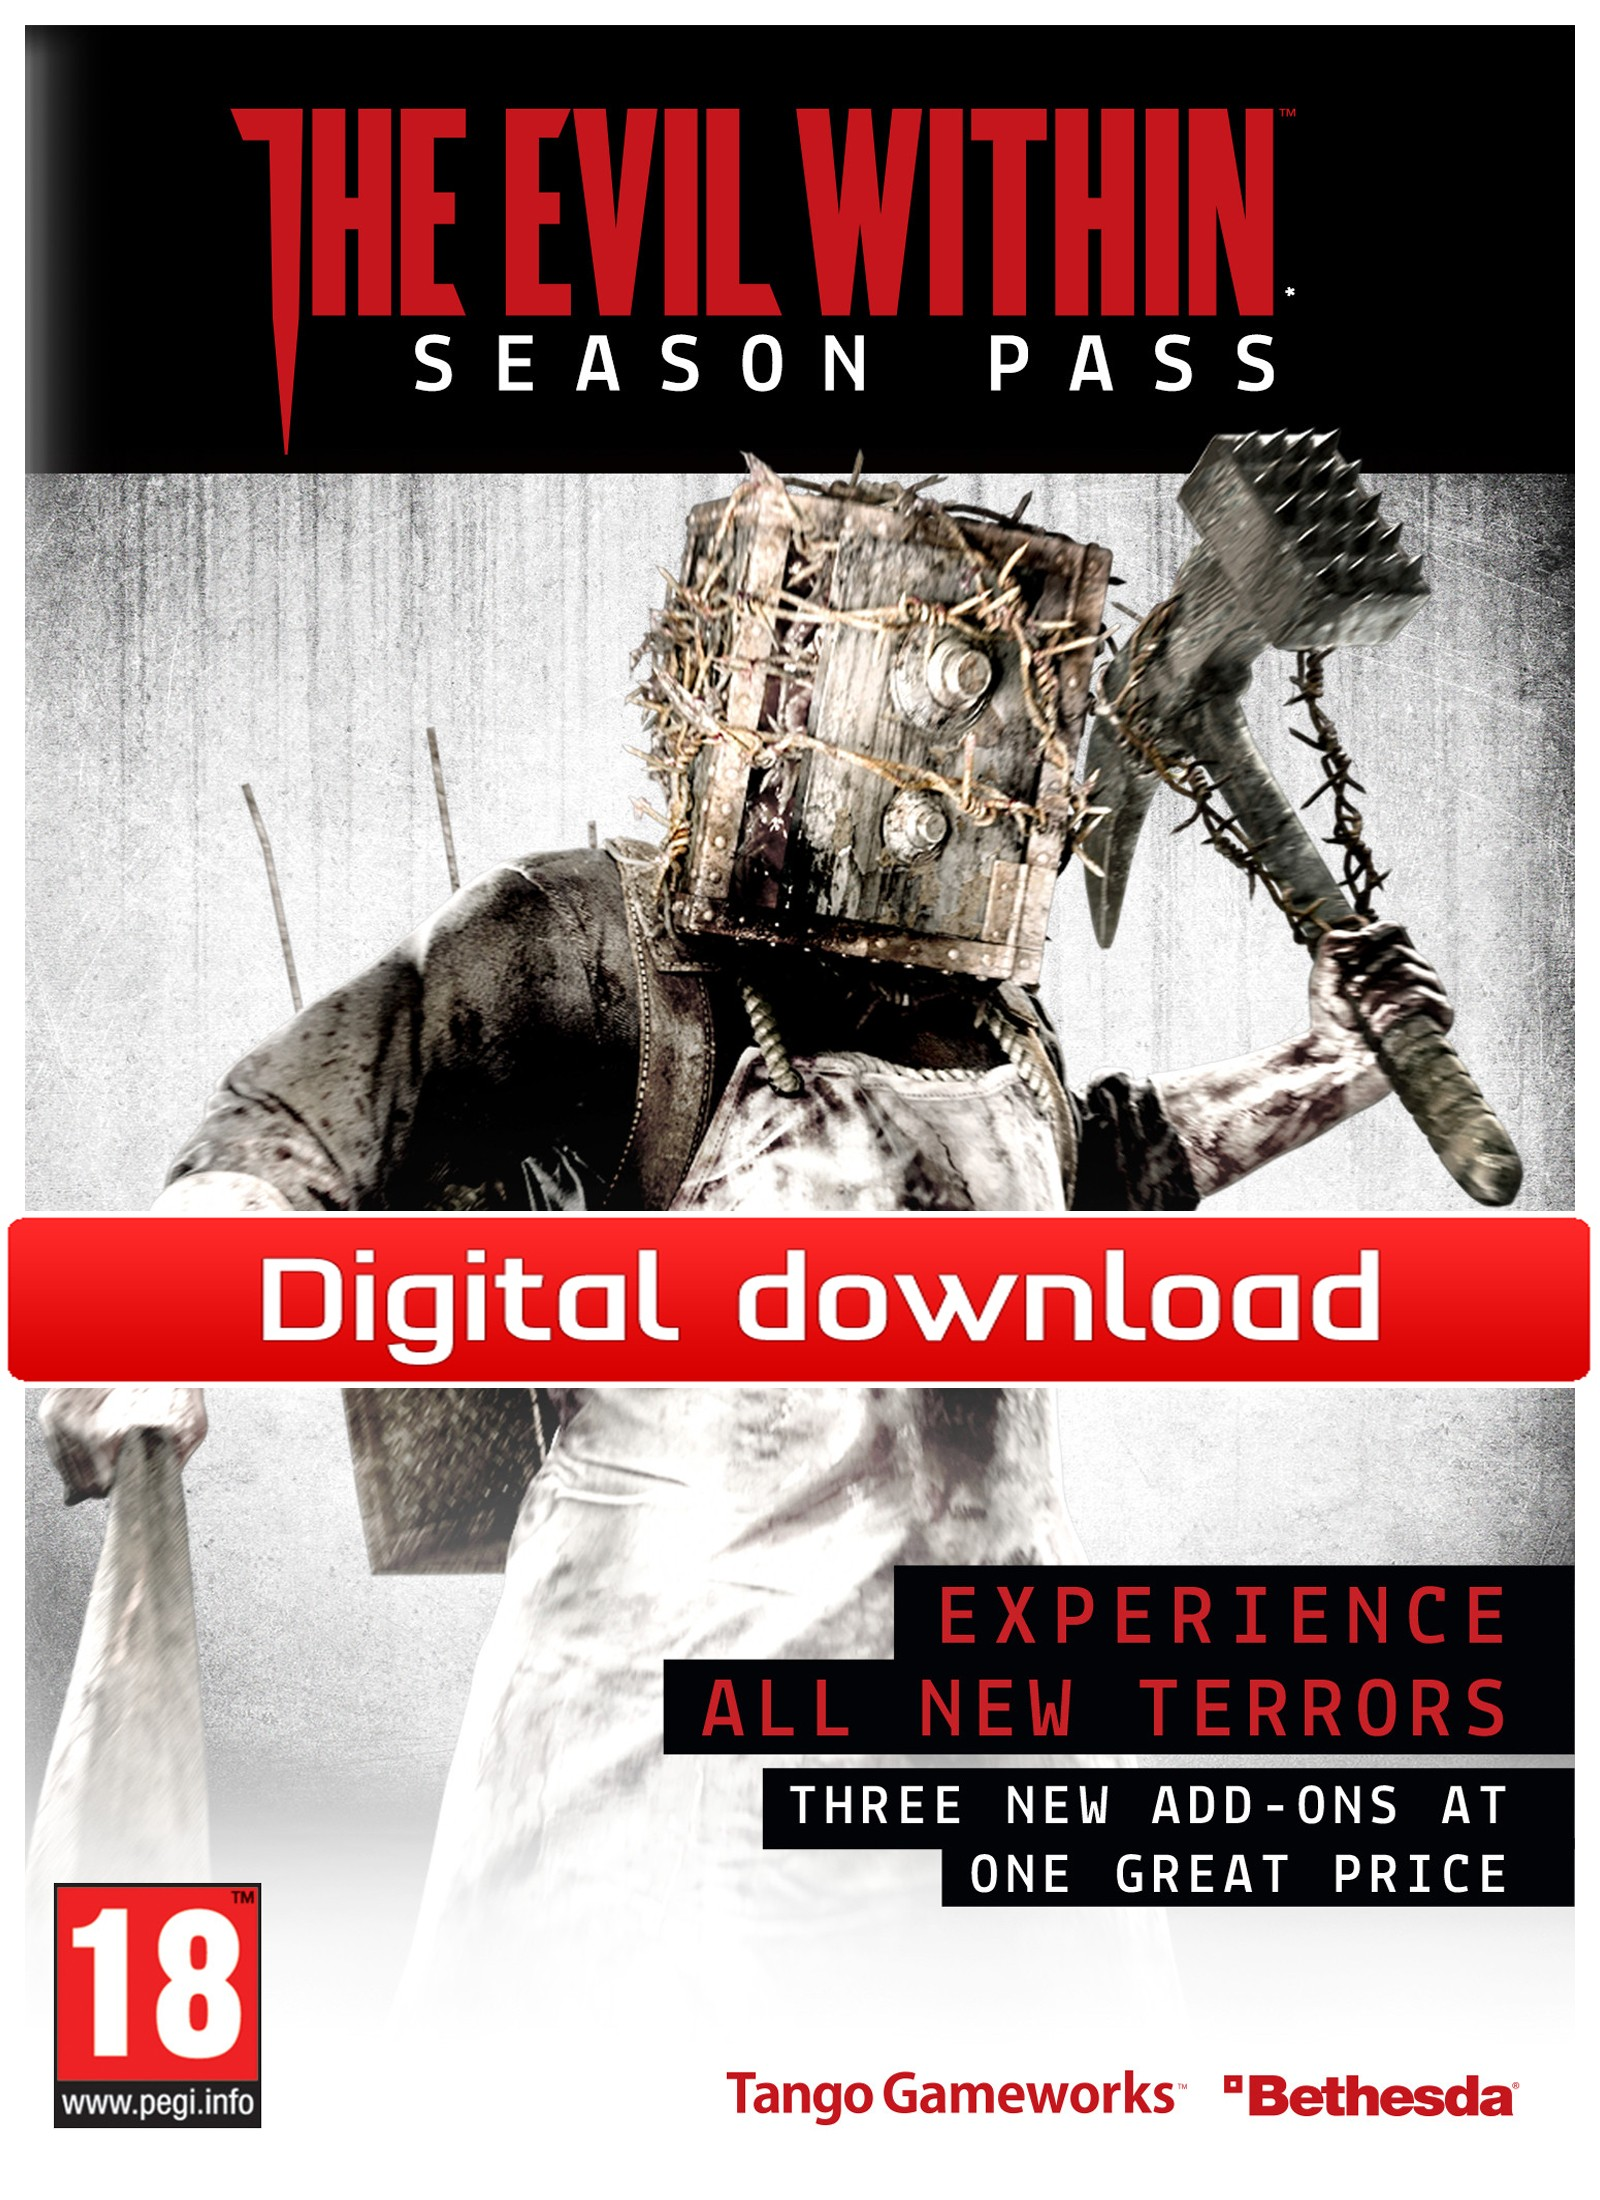 36195 : The Evil Within Season Pass DLC (PC nedlastning)